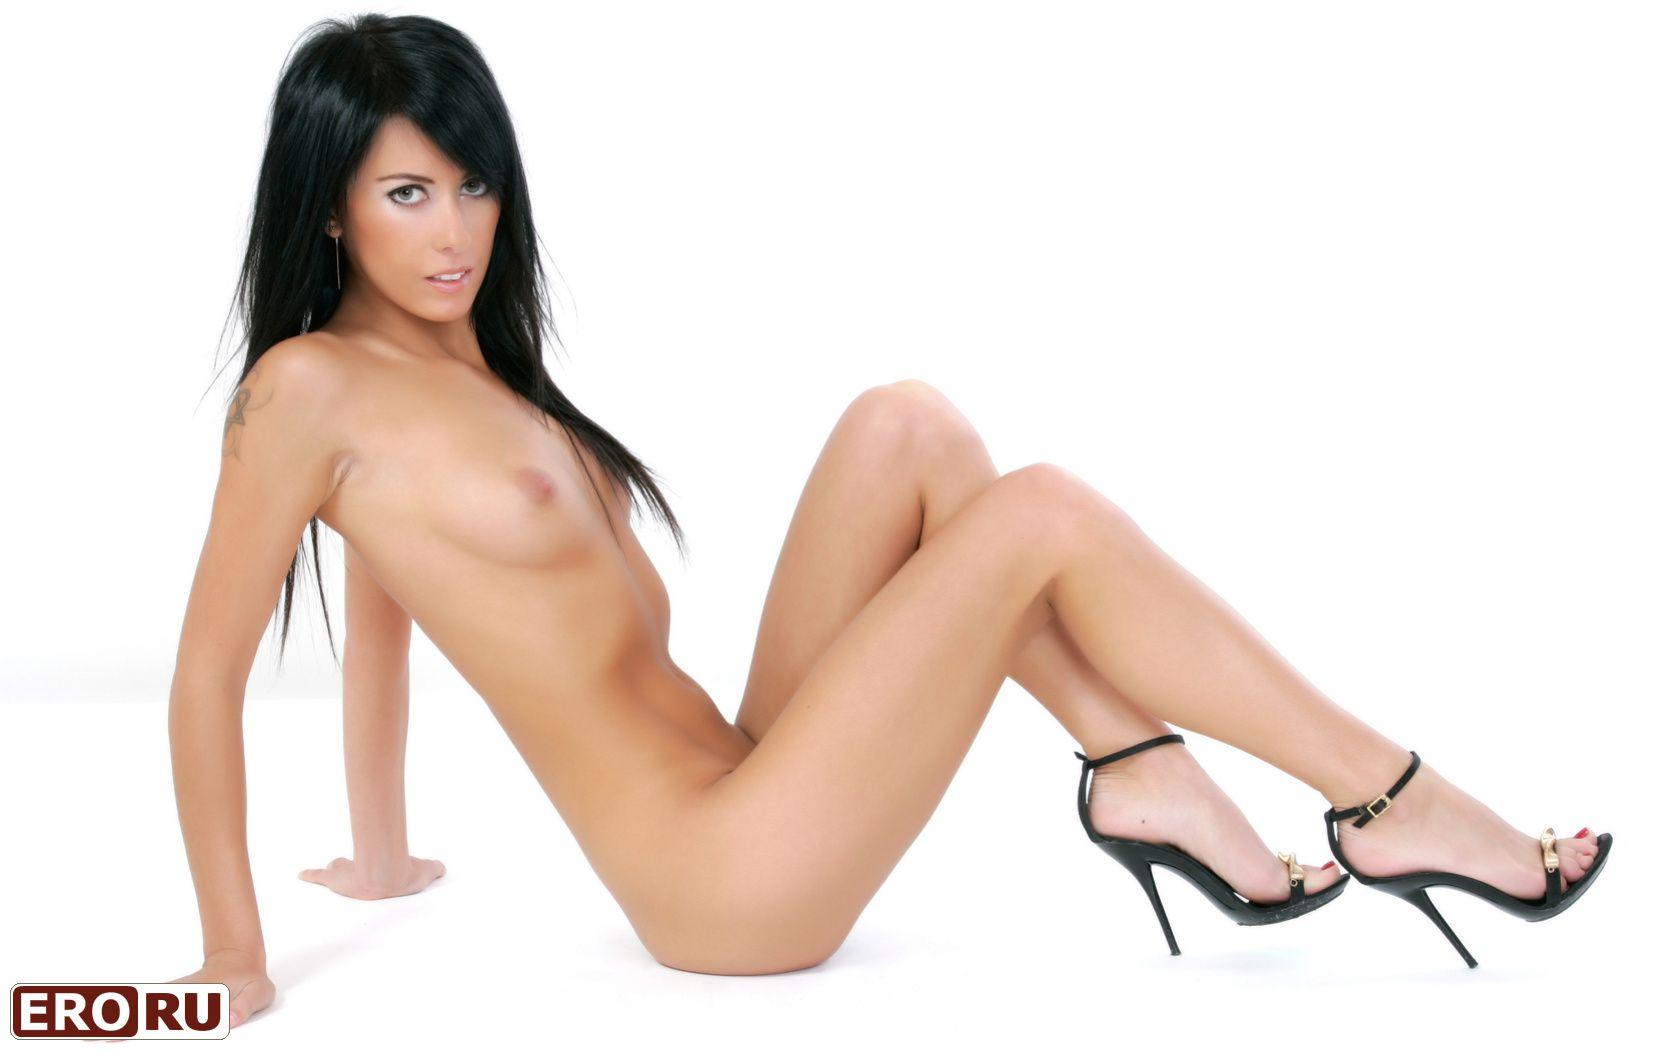 http://i1.imageban.ru/out/2010/08/02/74f6017fd7229d39ae7c691f372f6700.jpg